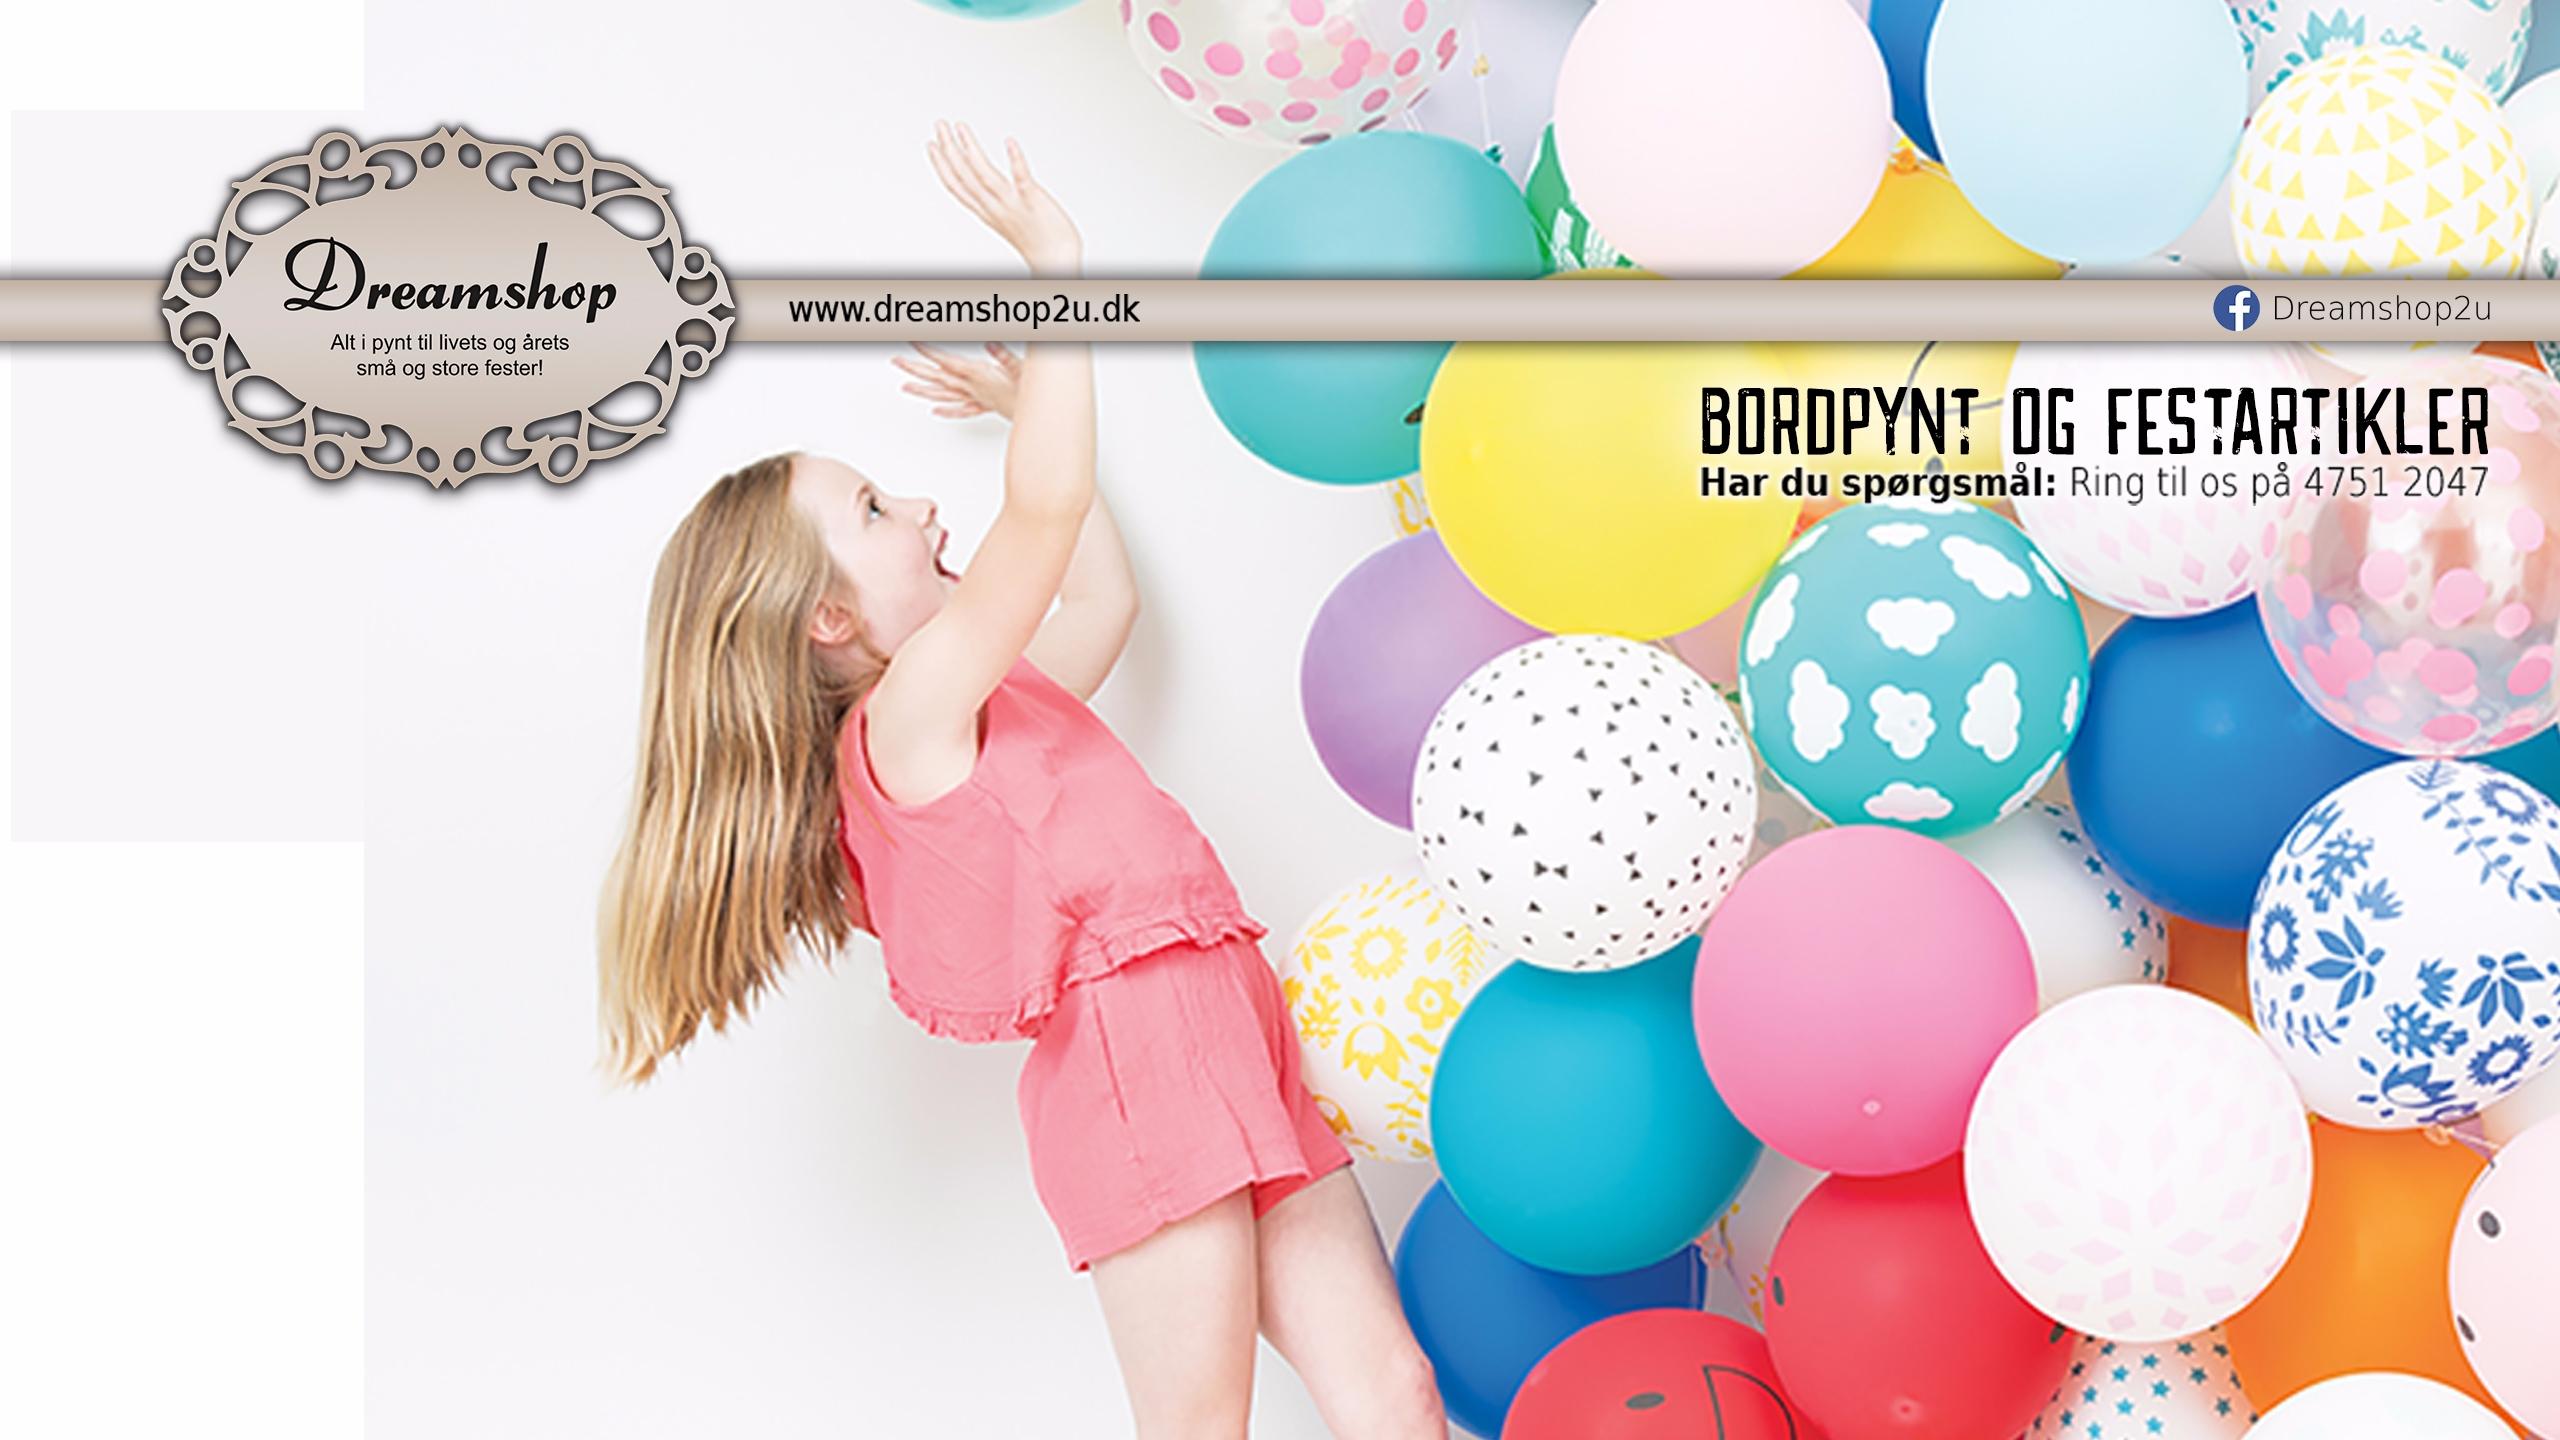 Dreamshop (@draemshop2u) Cover Image